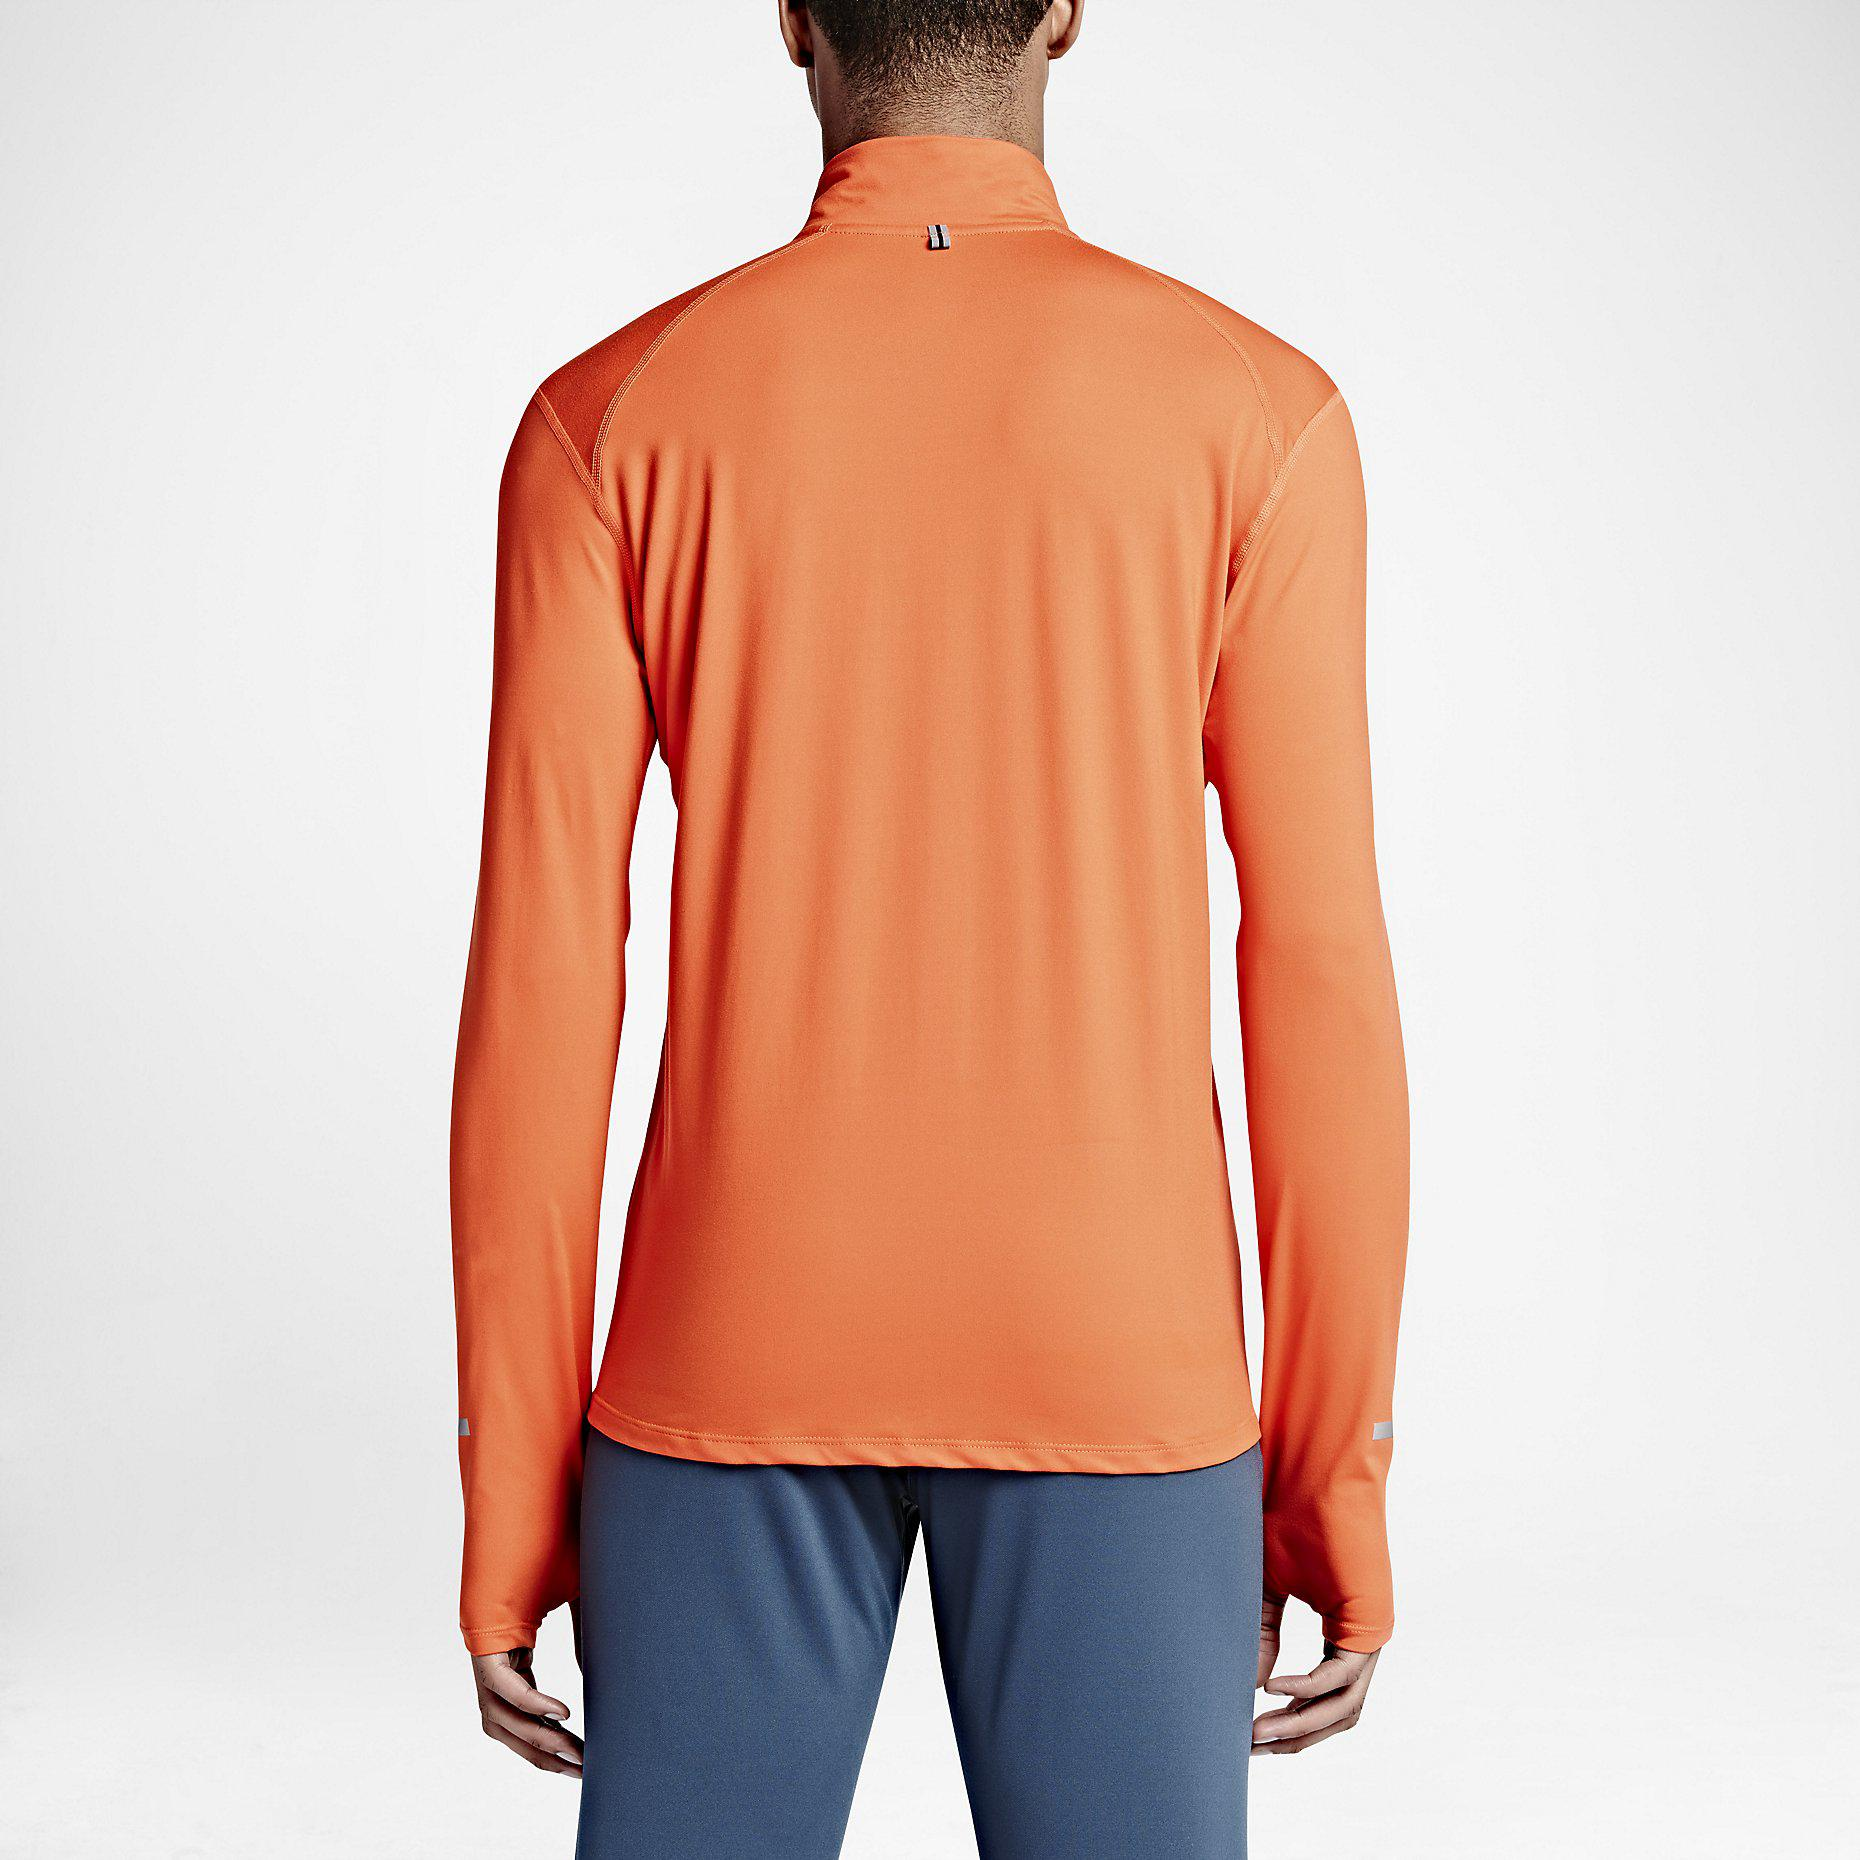 3a23f47c7 Nike Mens Dri-FIT Element Half-Zip Top - Team Orange - Tennisnuts.com